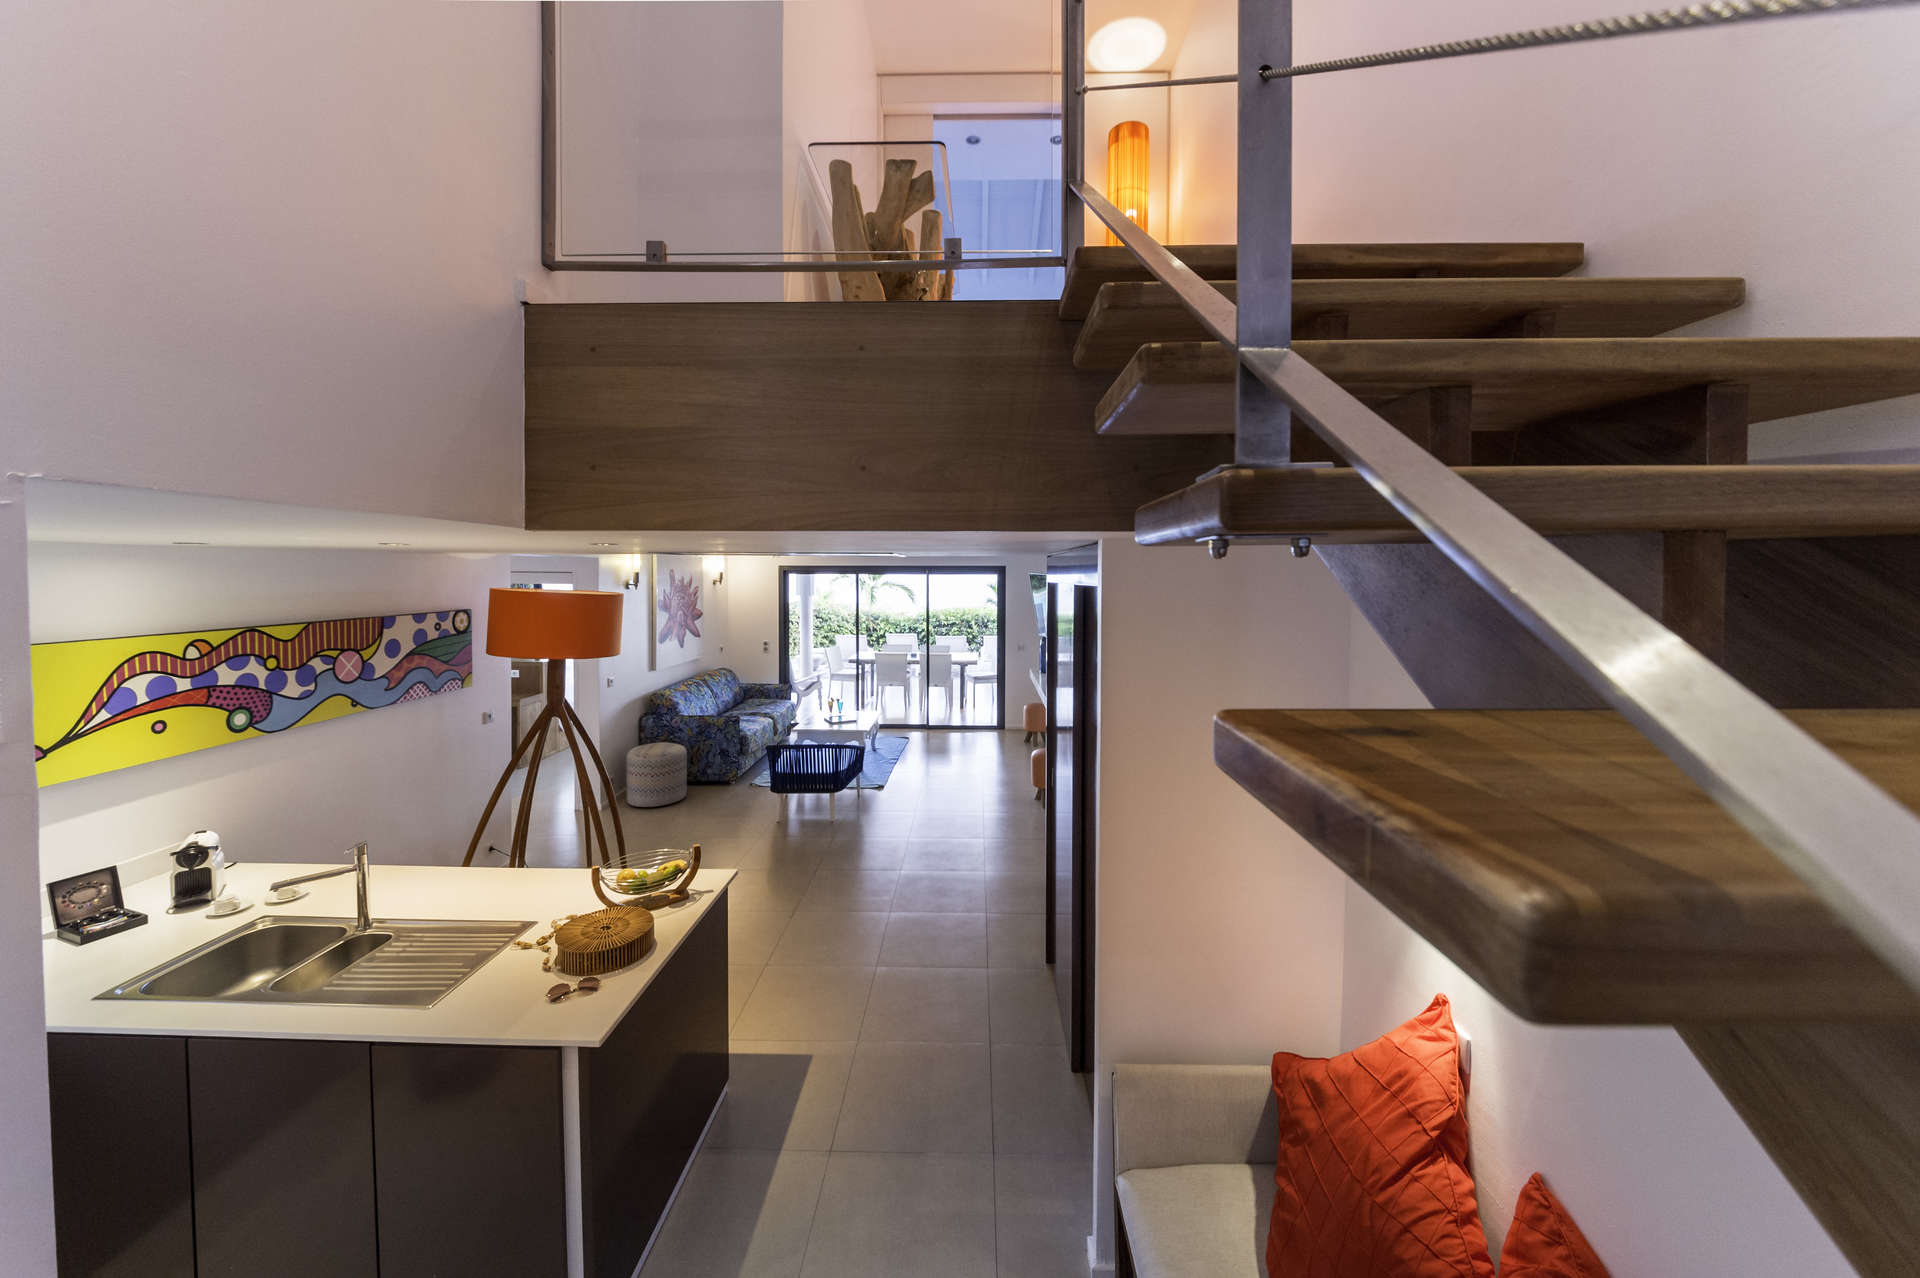 Luxury villa rentals caribbean - Guadeloupe - La toubana hotel and spa - No location 4 - Classic Suites - Image 1/5